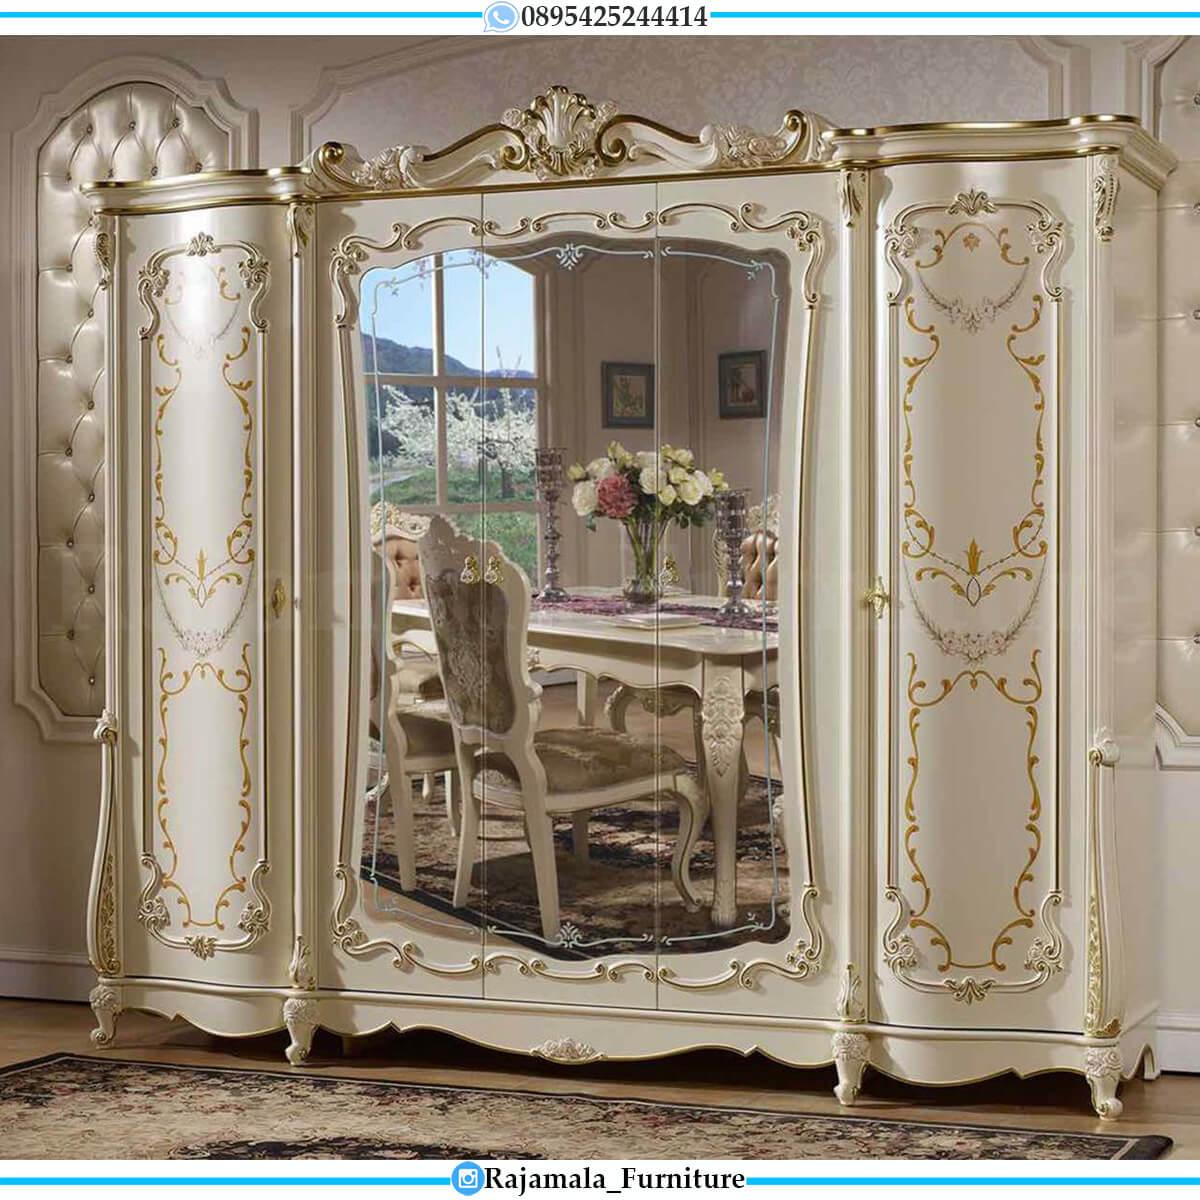 Harga Lemari Pakaian Mewah Kaca Luxury Carving Marquetry Style RM-0559